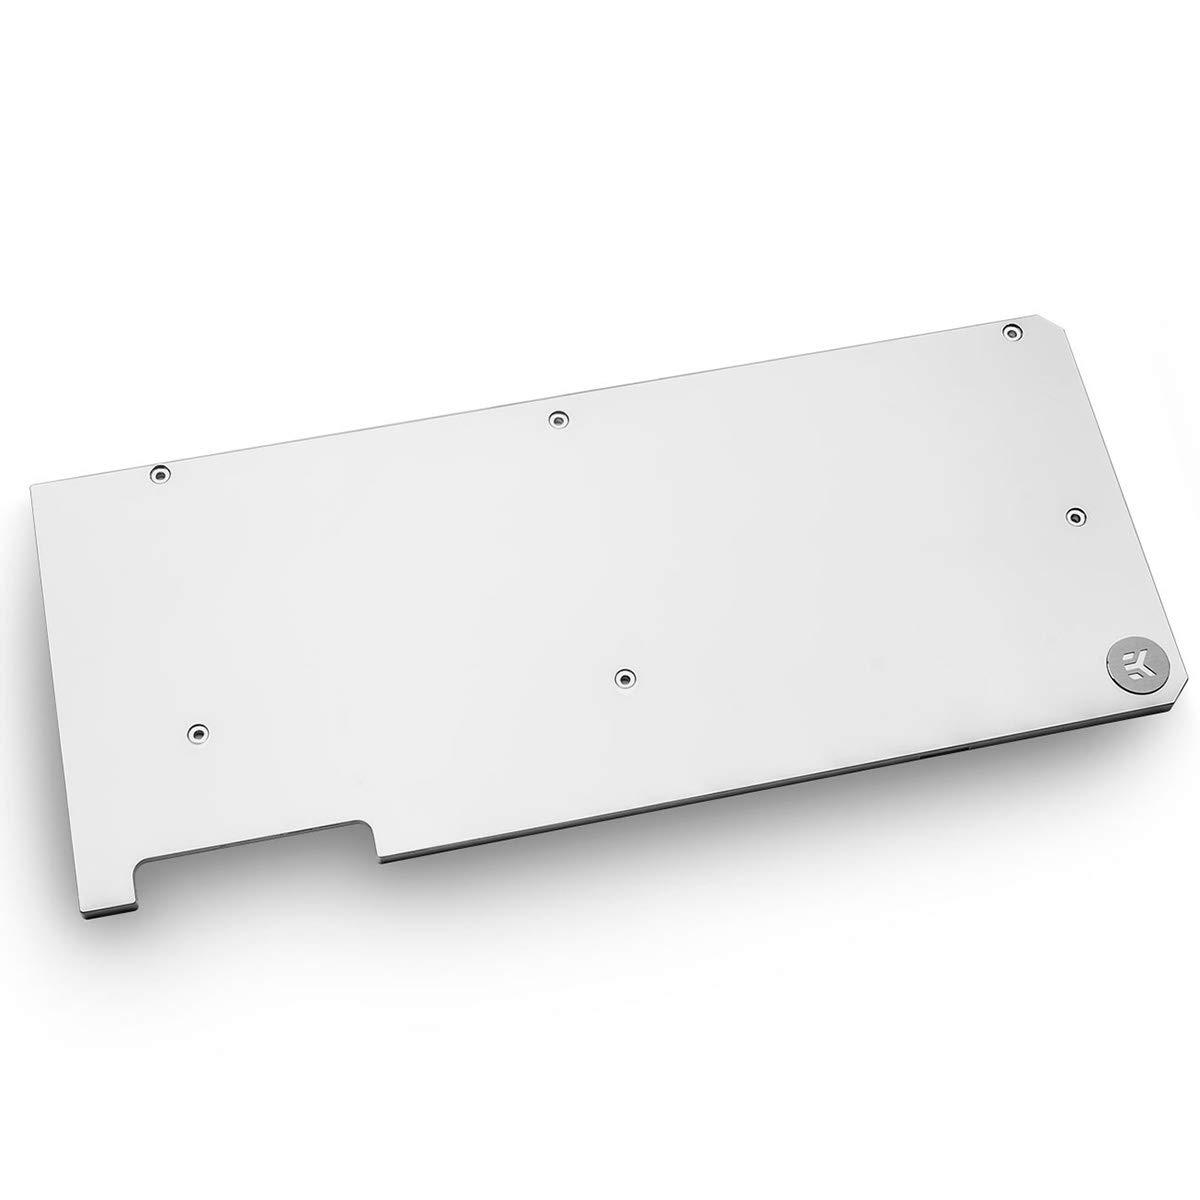 EKWB EK-Vector FTW3 RTX 2080 Ti Backplate, Nickel